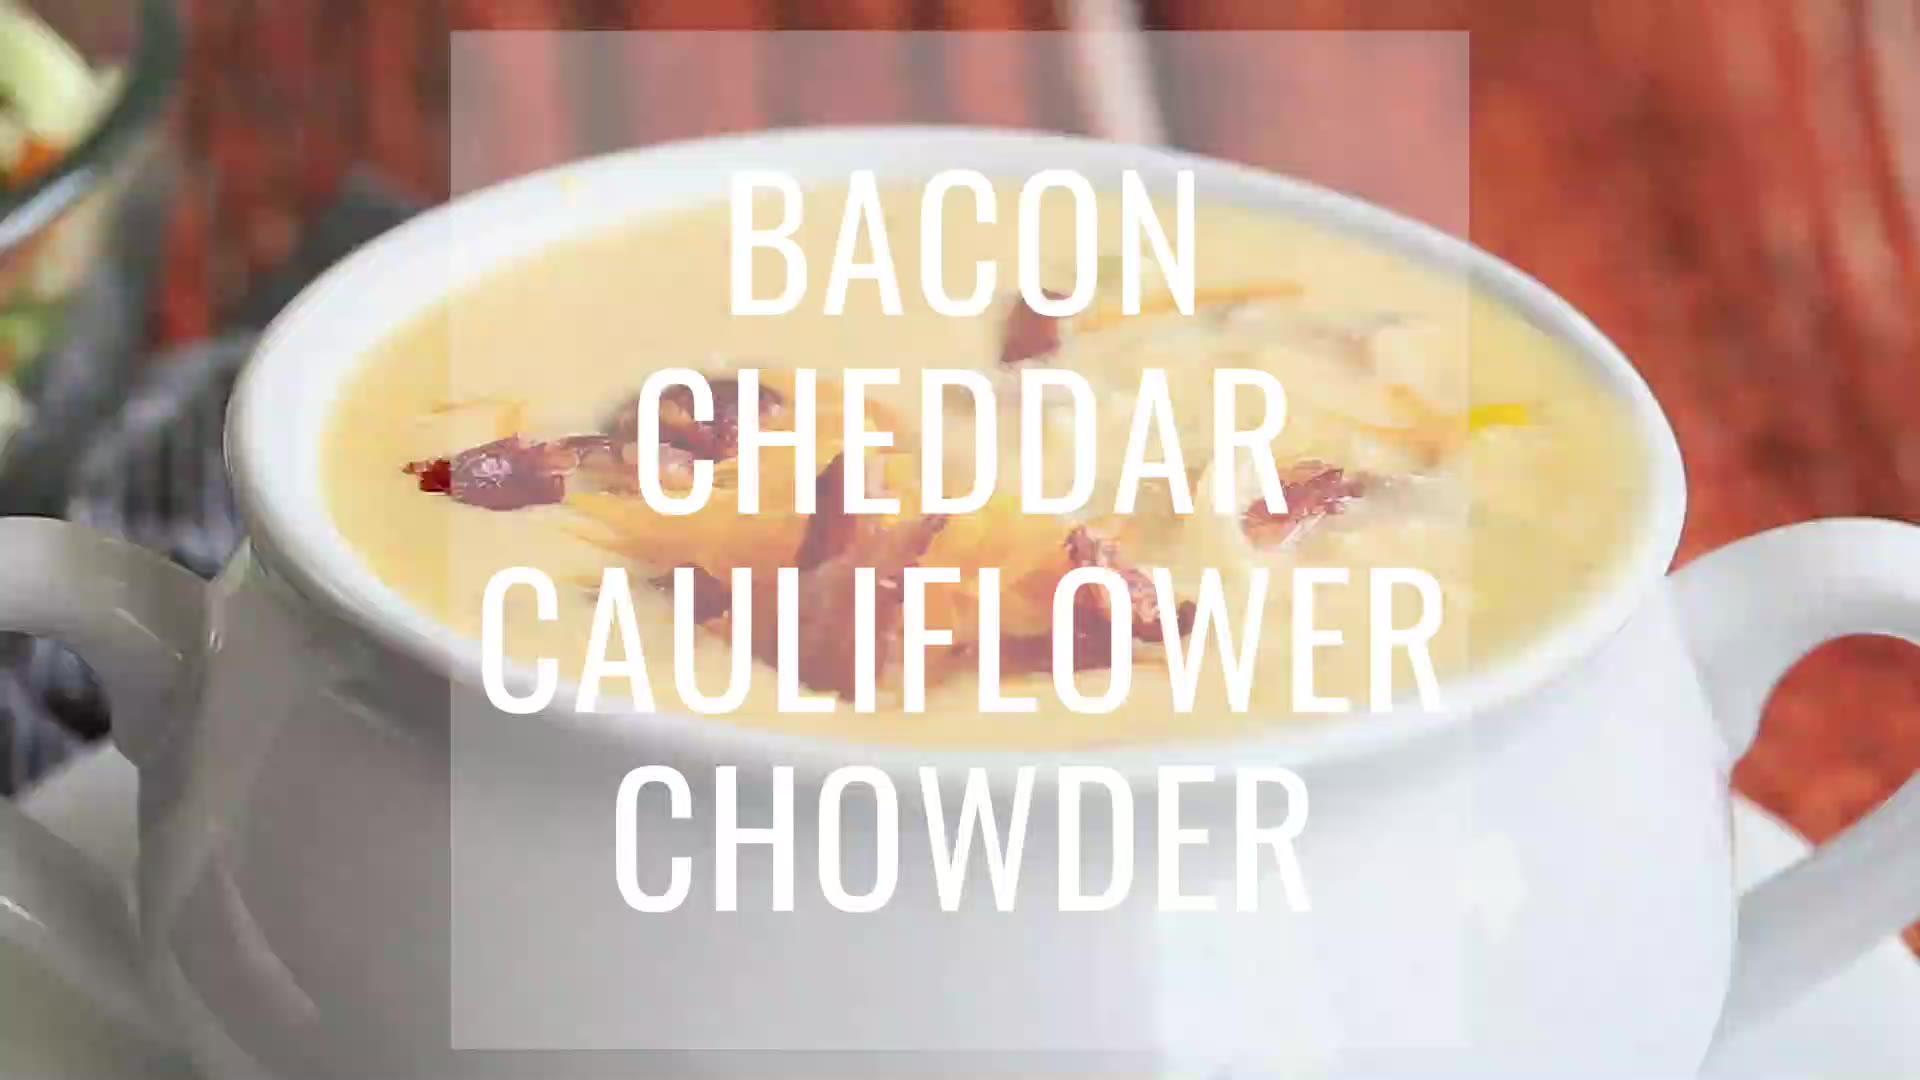 Bacon-Cheddar Cauliflower Chowder (Low-Carb Alternative to Baked Potato Soup) Video - Iowa Girl Eats